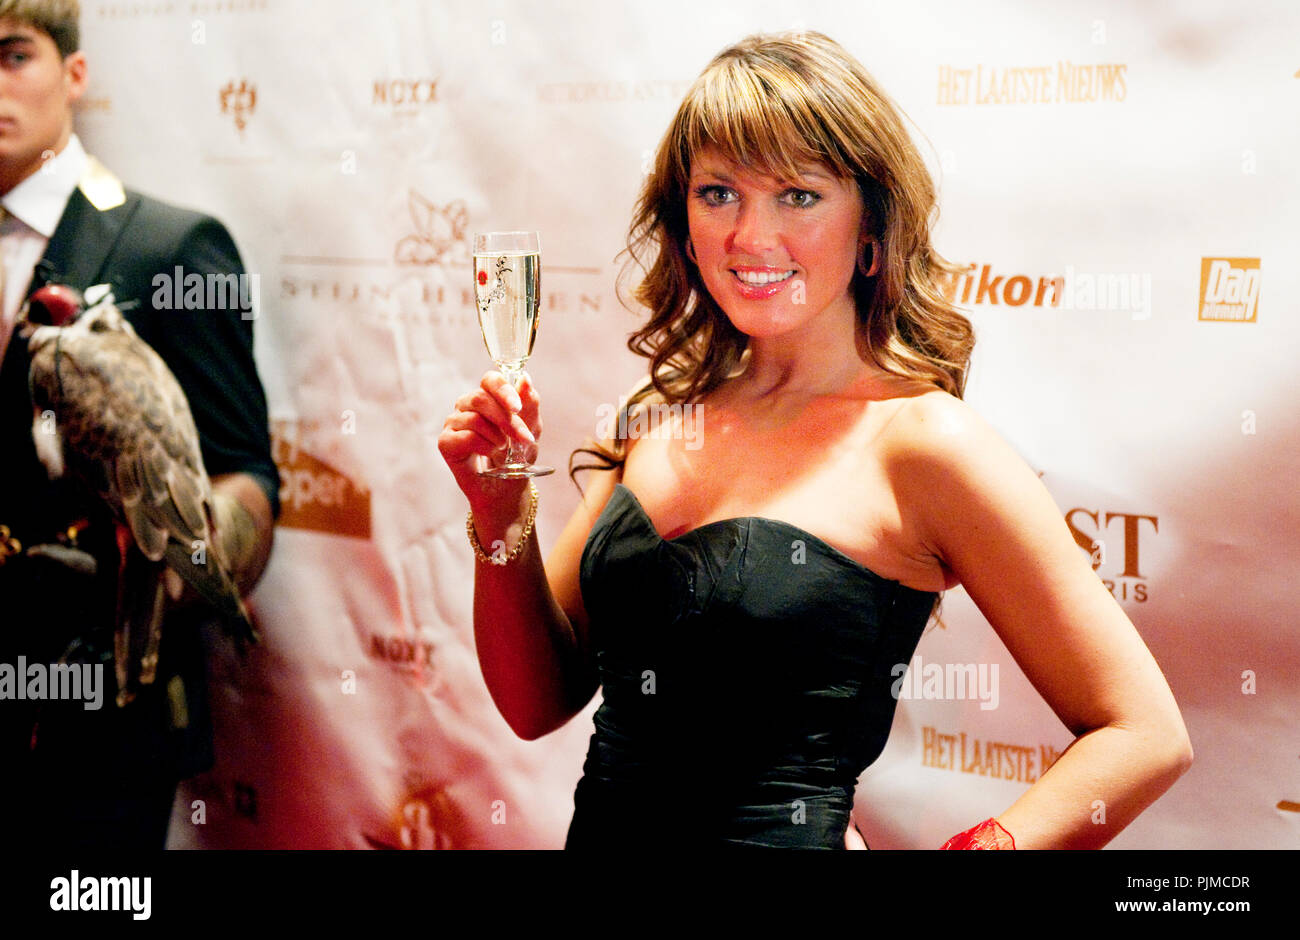 Angela Featherstone Nude Photos